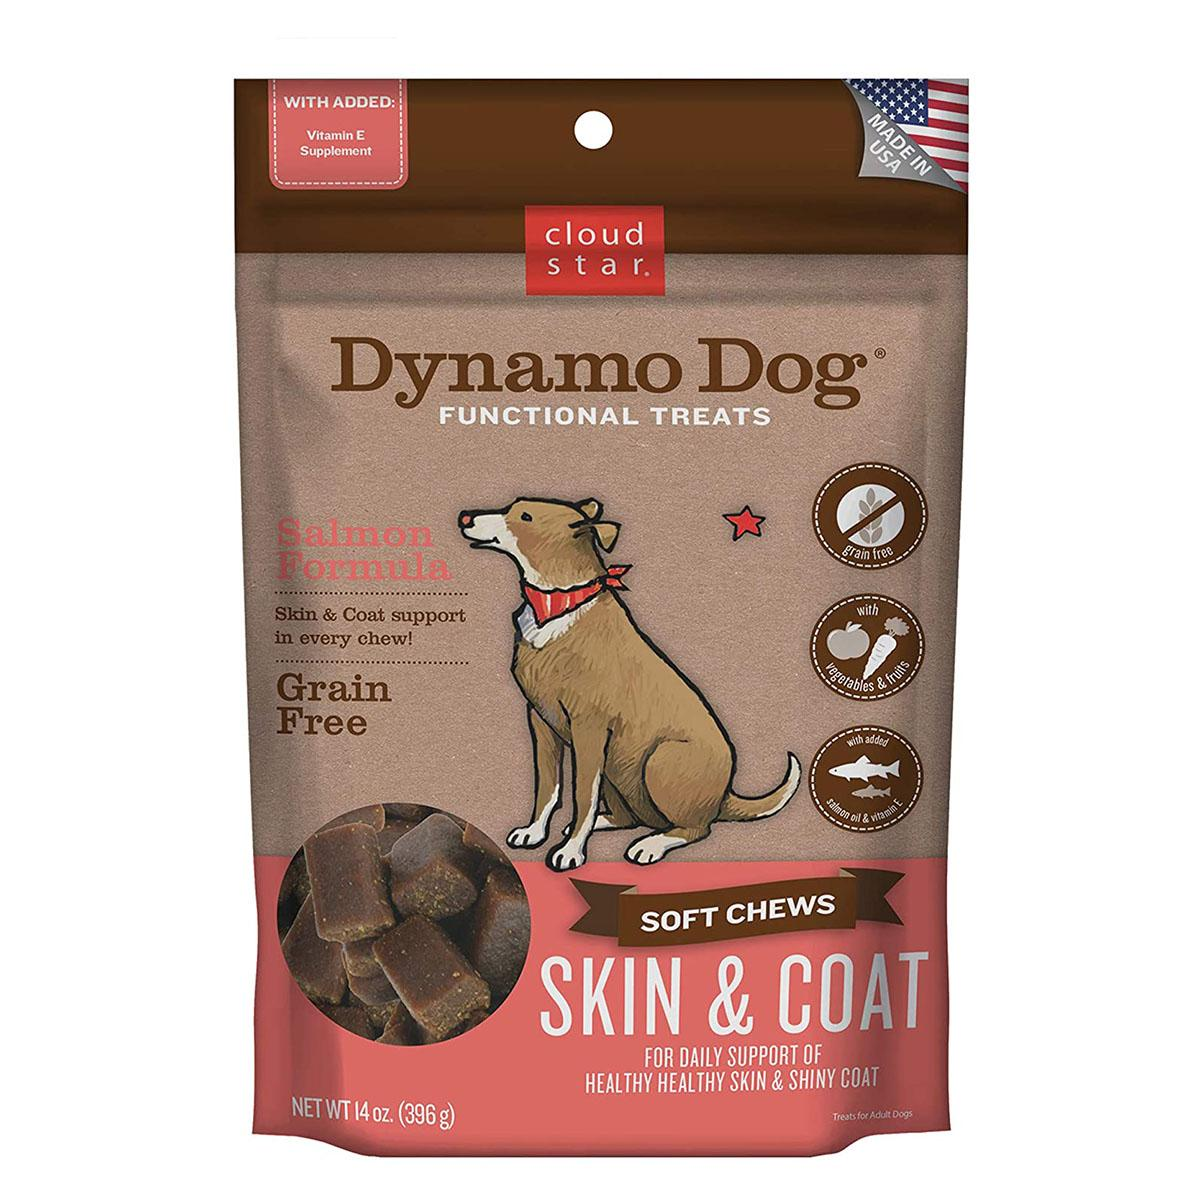 Dynamo Dog Skin and Coat Dog Treats - Salmon